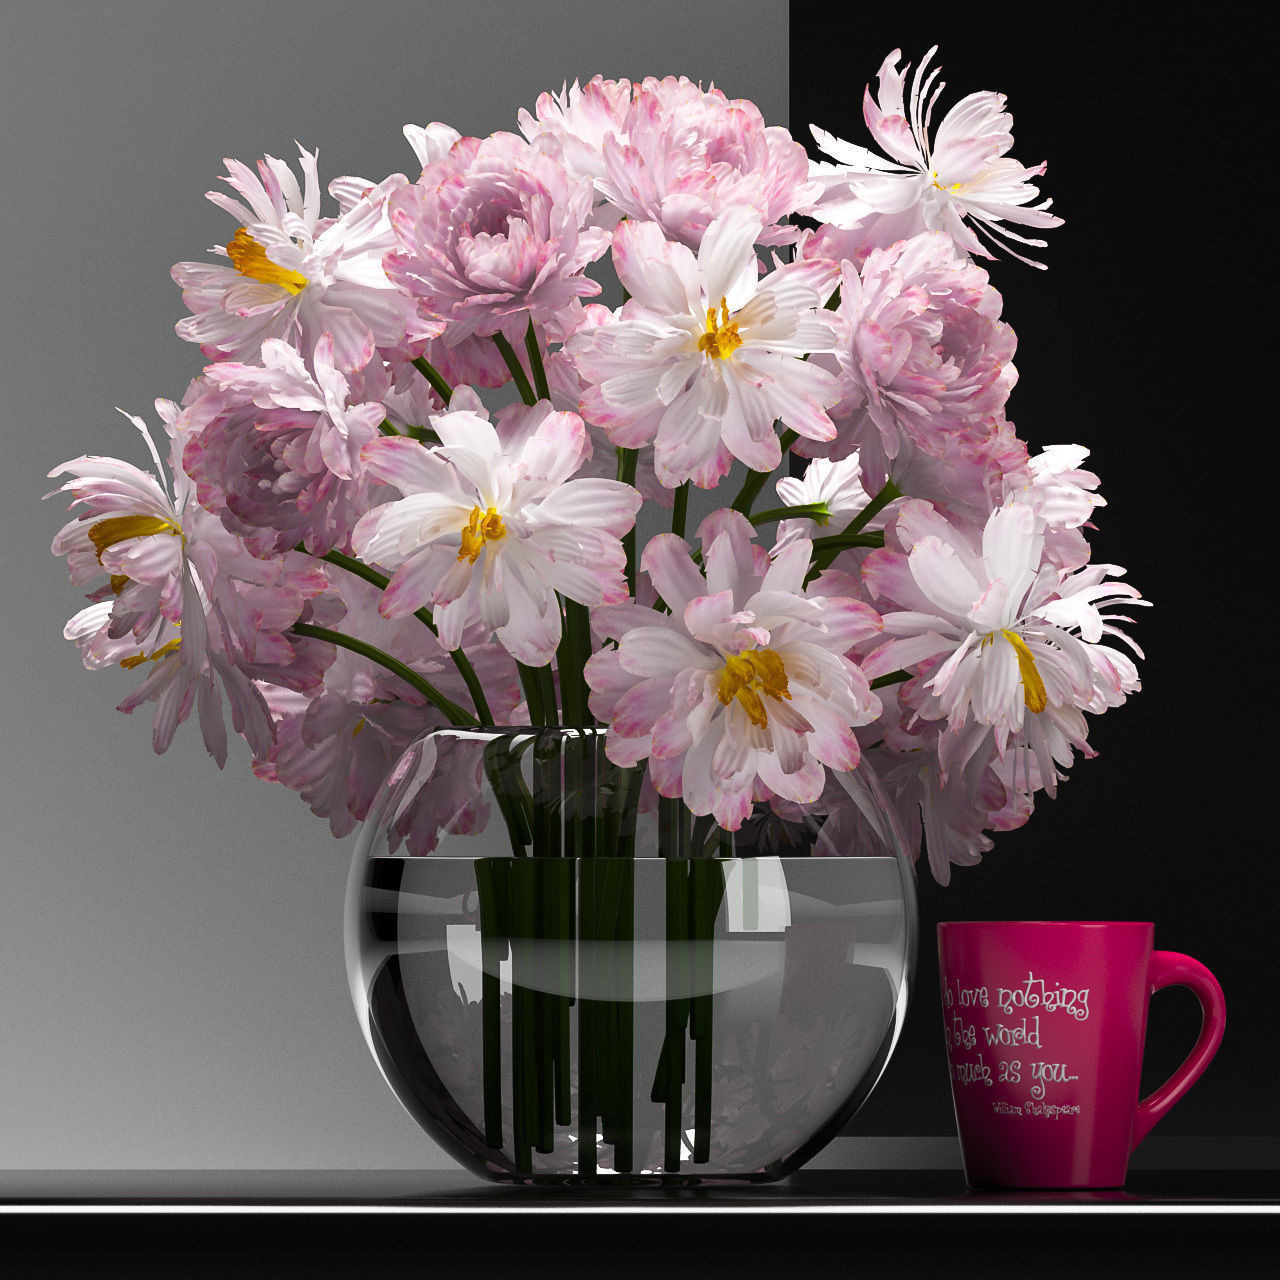 chinese cloisonne antique vases of antique flower vase collection wrh 20preview 2001h vases 3d flower inside antique flower vase collection wrh 20preview 2001h vases 3d flower vase preview 0